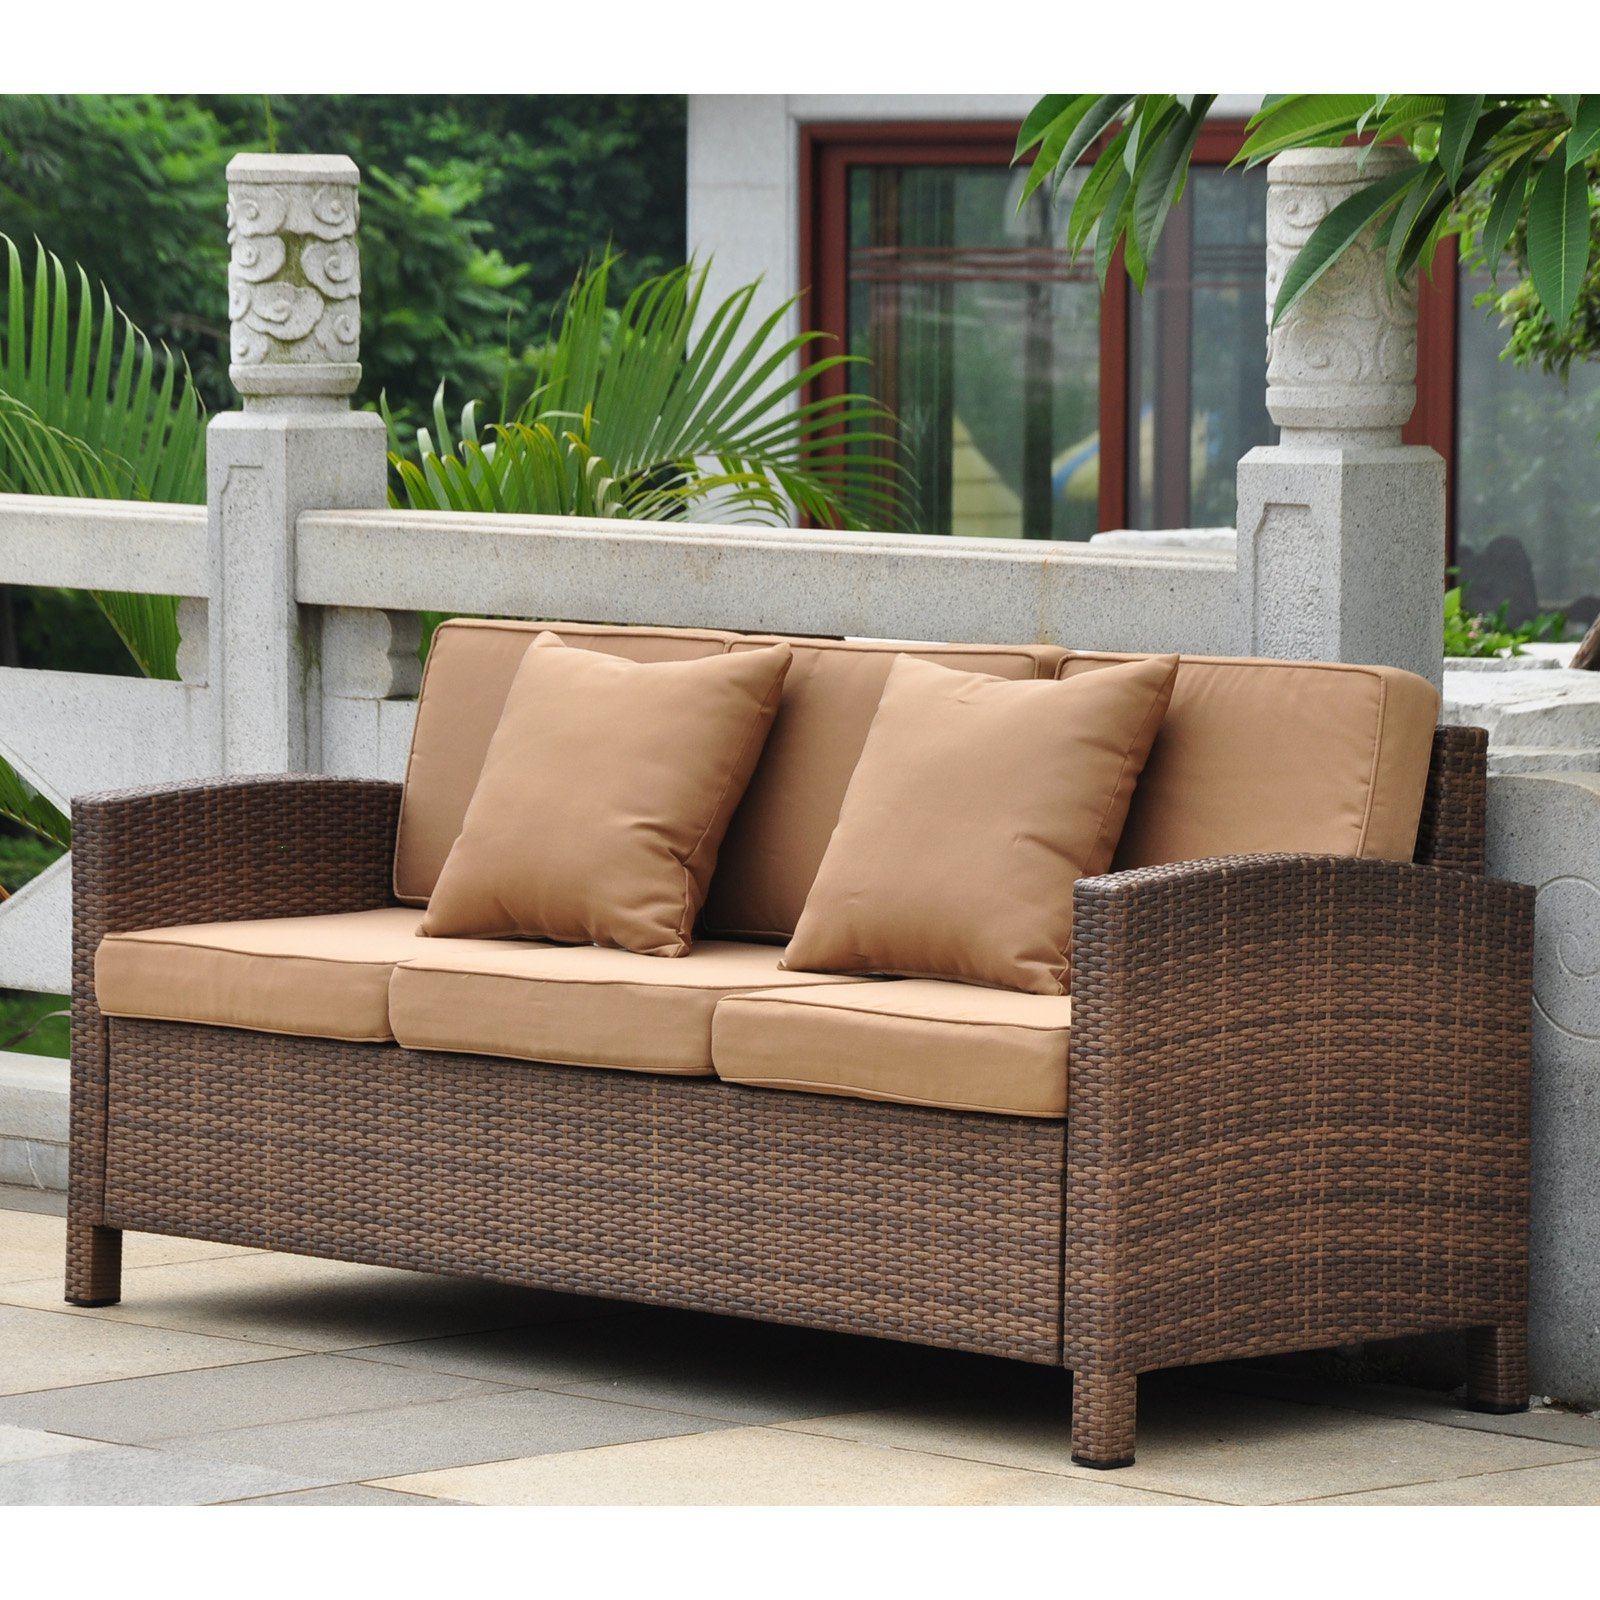 International Caravan Barcelona Resin Wicker Patio Sofa With Cushions    Walmart.com